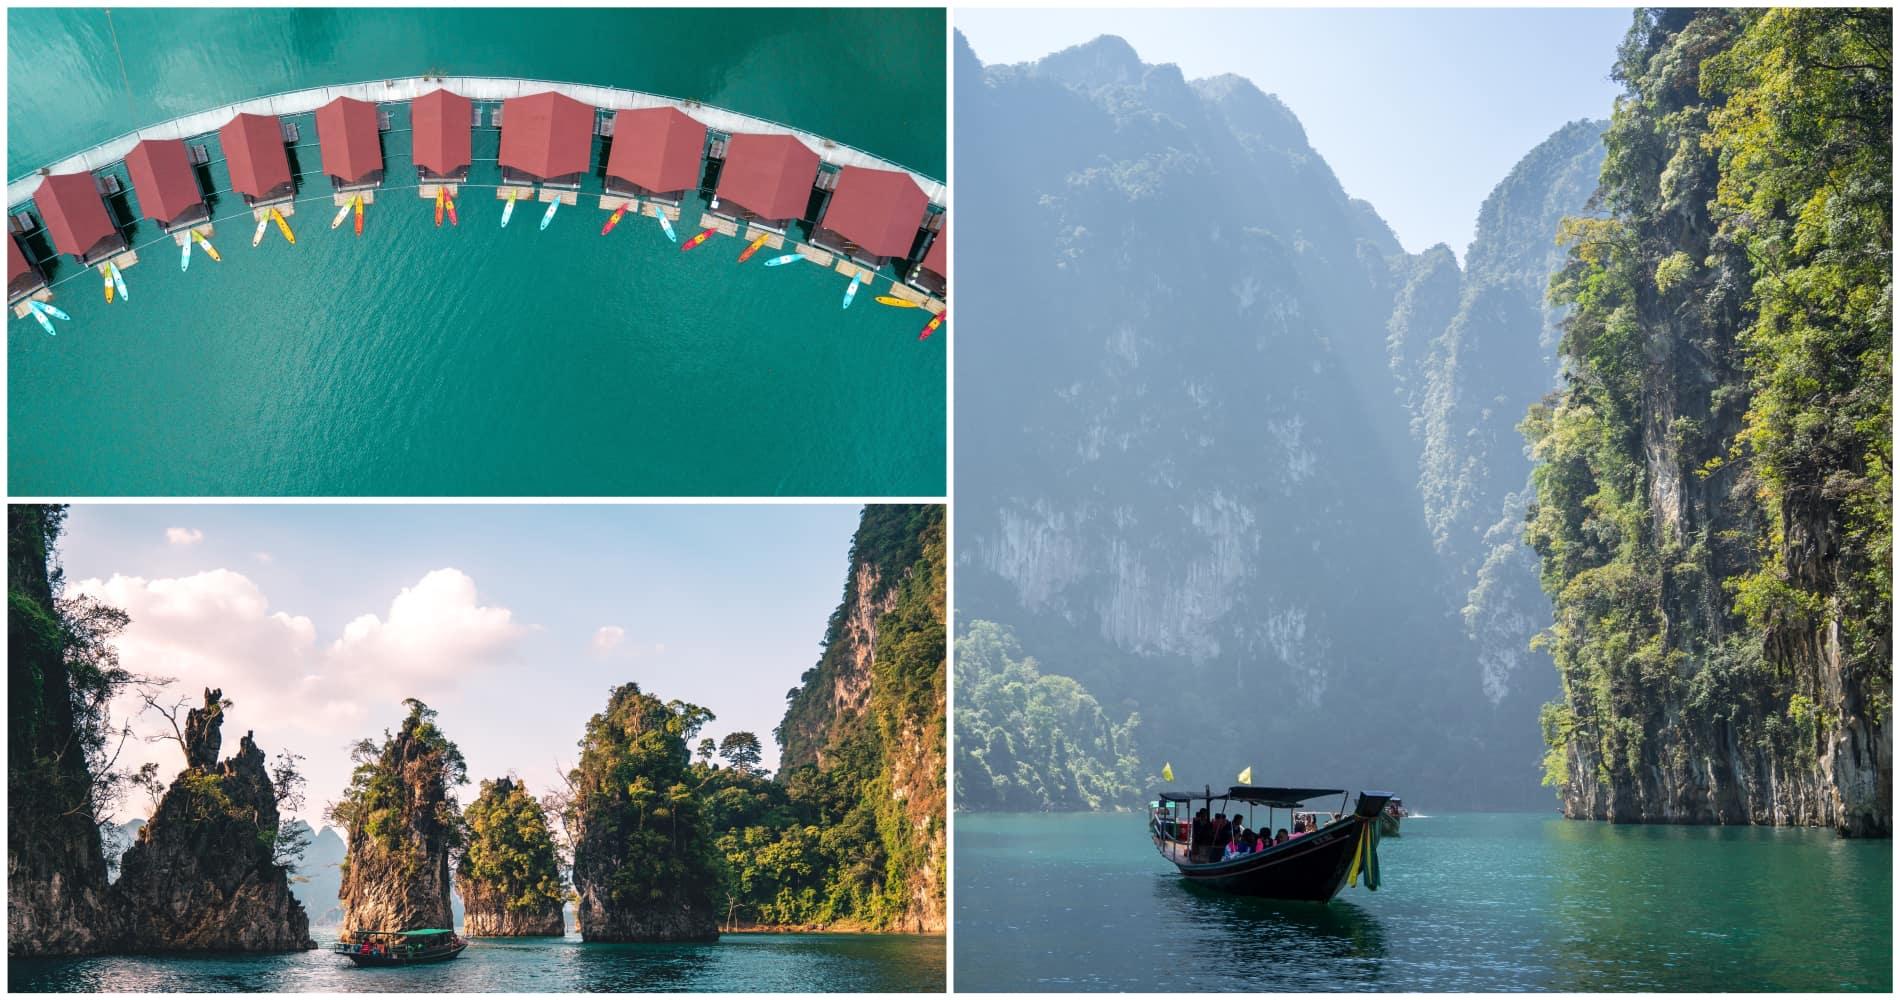 khao sok, thailand, taizeme, kao sok nacionālais parks, cheow lan, čeo lan ezers